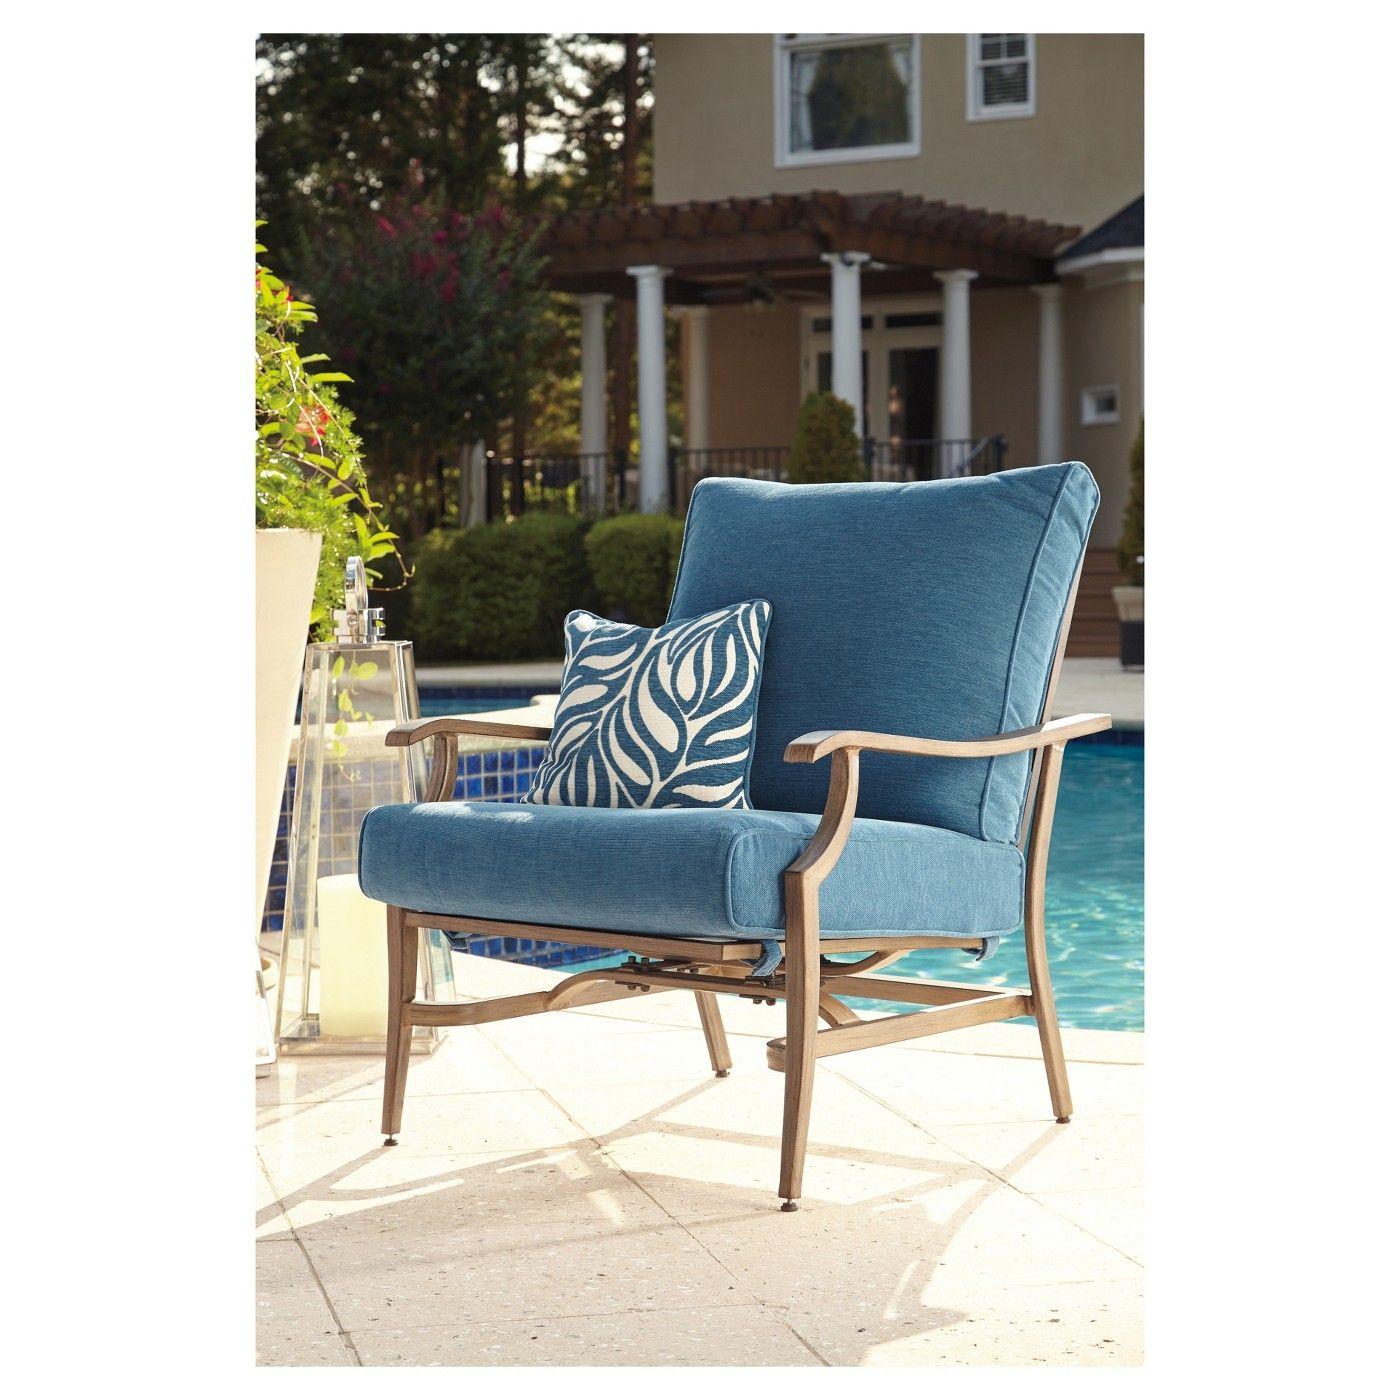 Partanna 2pk Metal Patio Motion Lounge Chair Blue/Beige